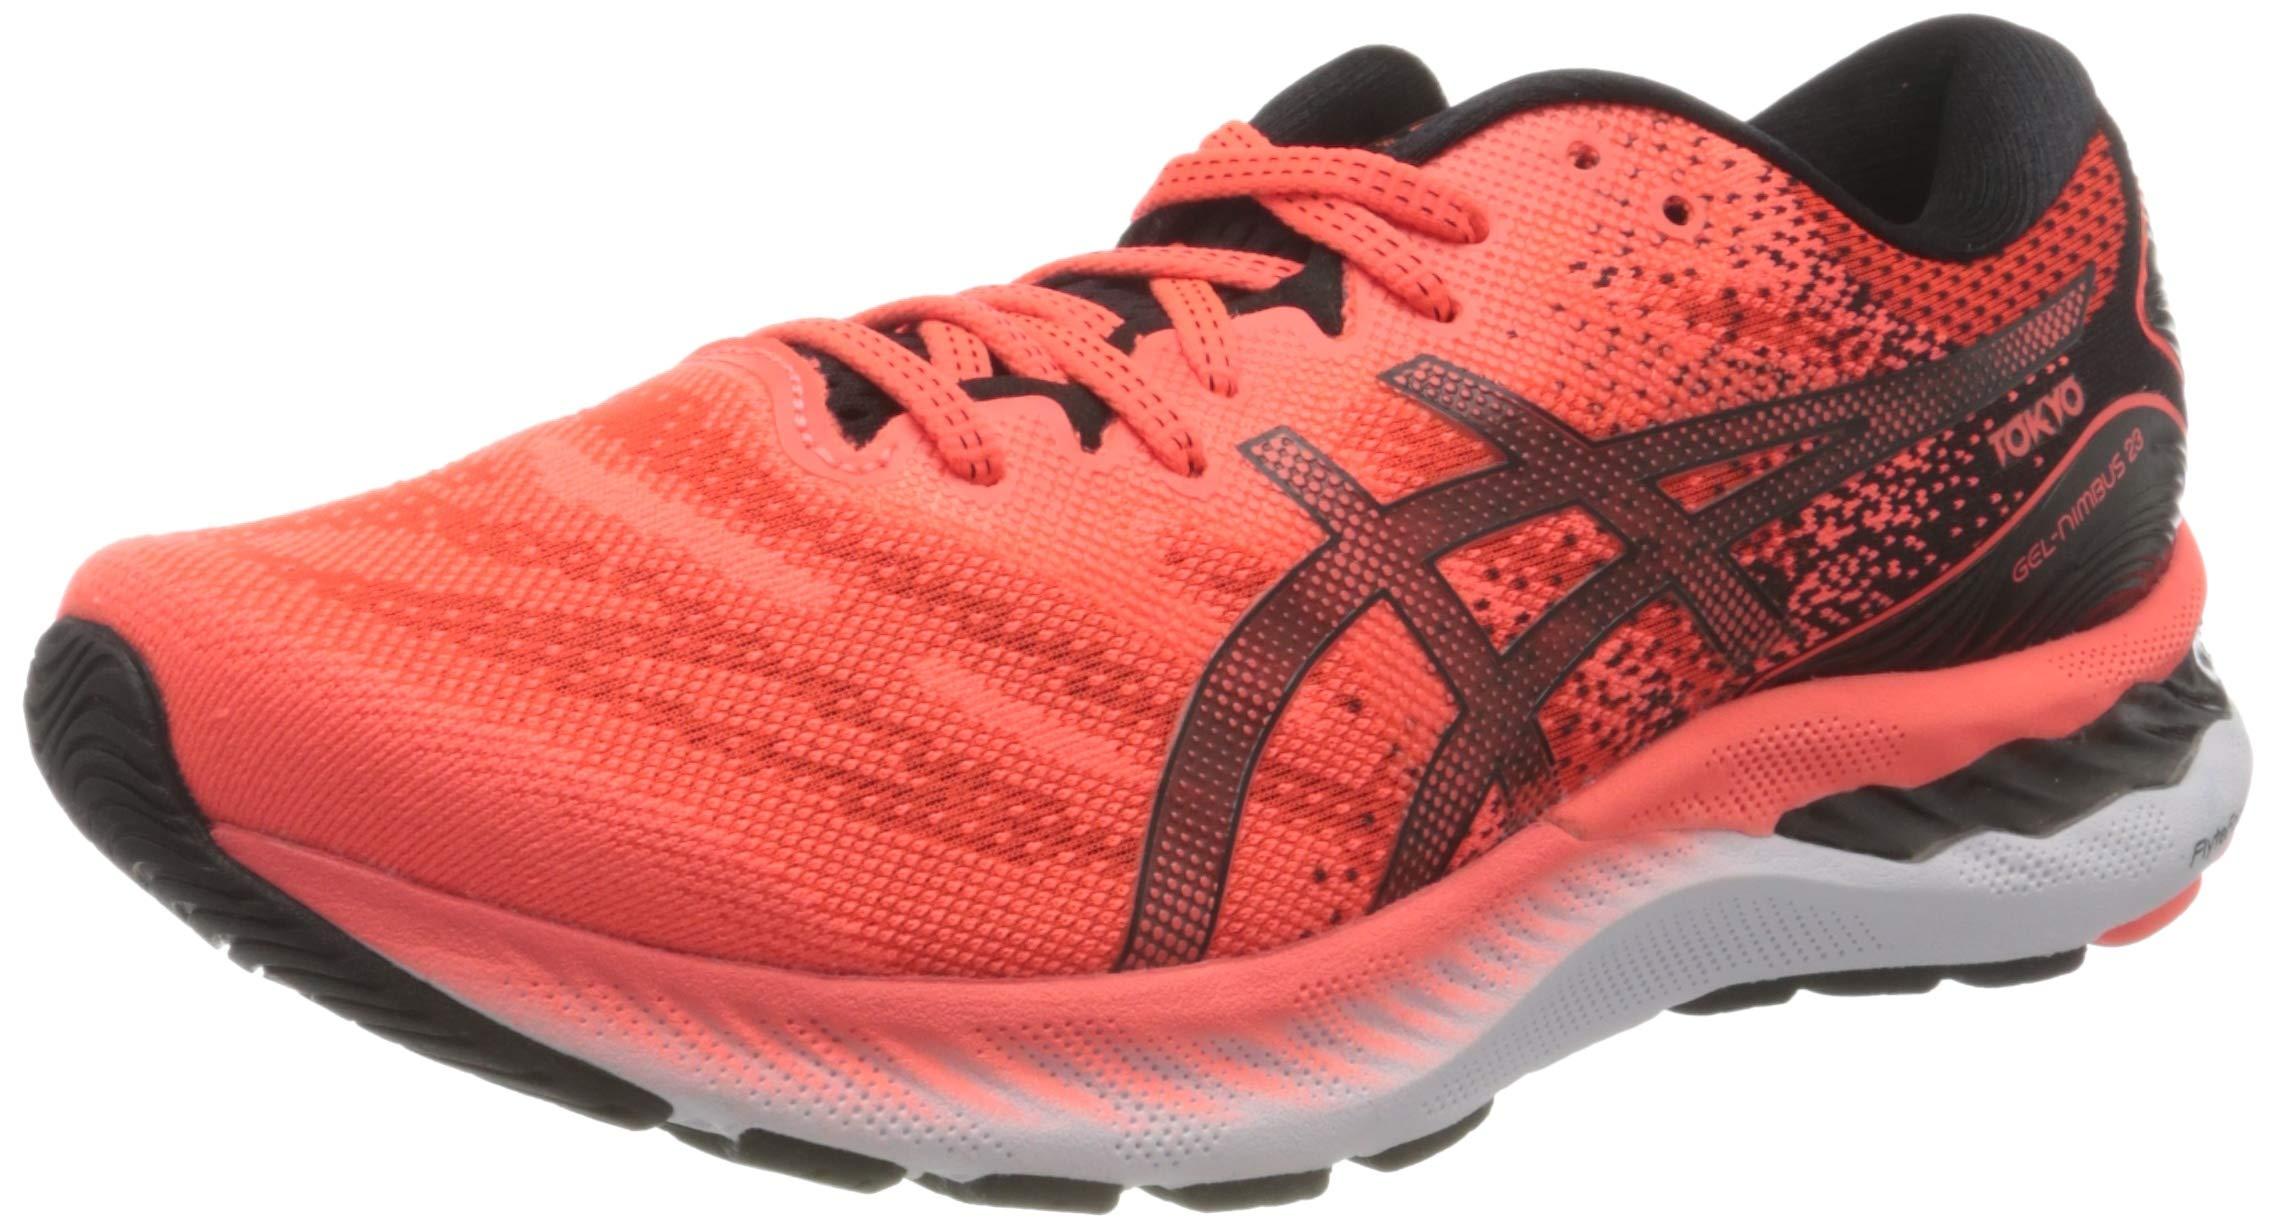 ASICS Herren Gel-Nimbus 23 Tokyo Running shoes, Rot (Sunrise Red/Black), 41.5 EU